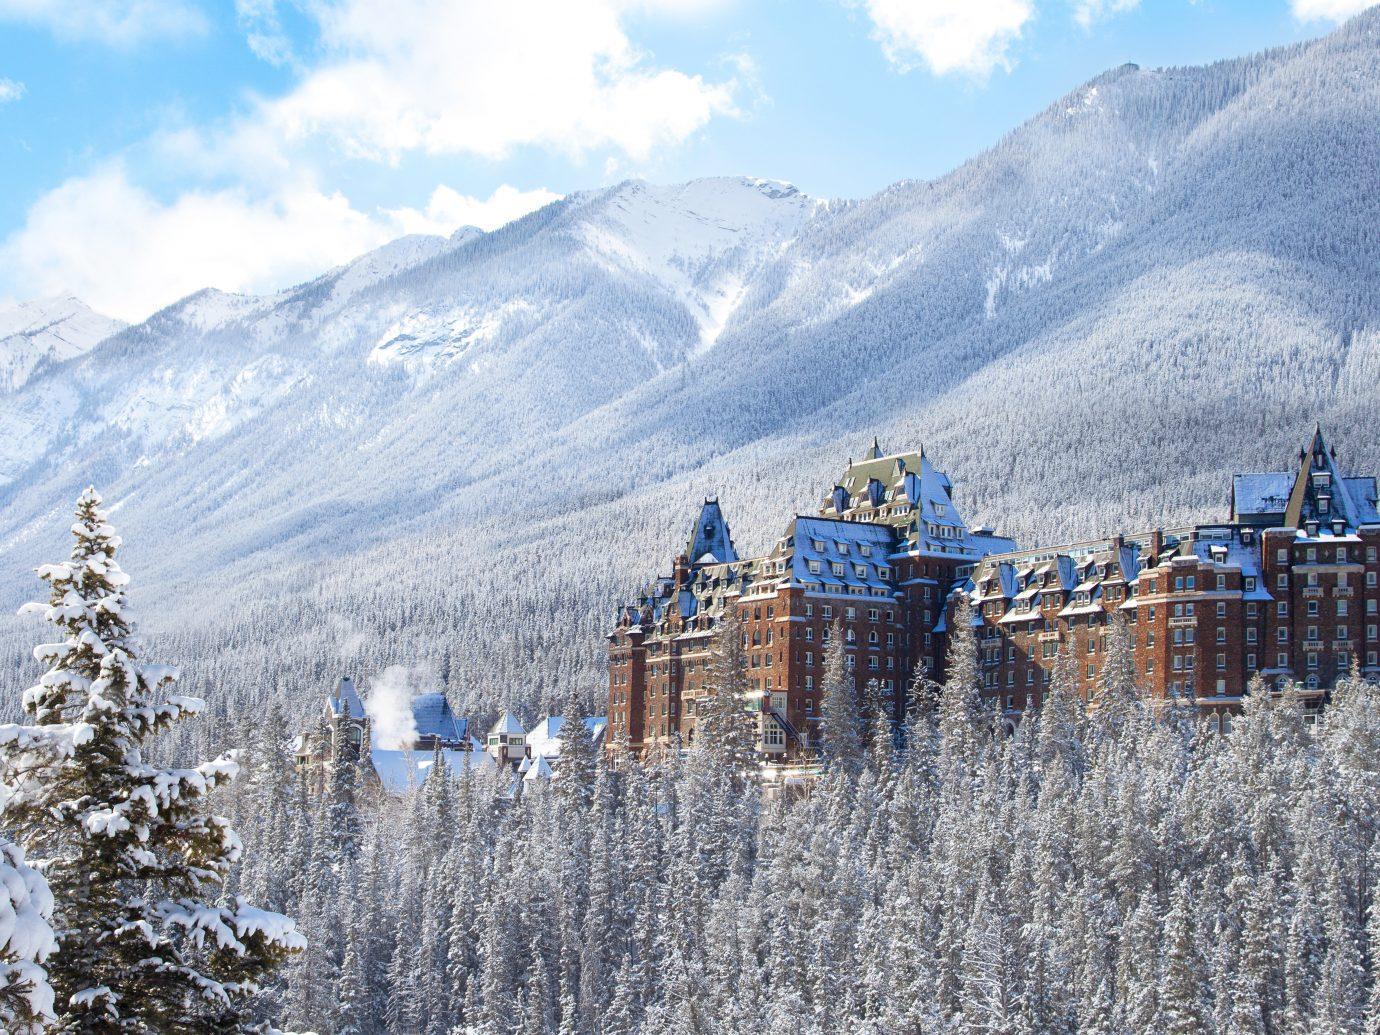 Exterior of Fairmont Banff Springs Hotel